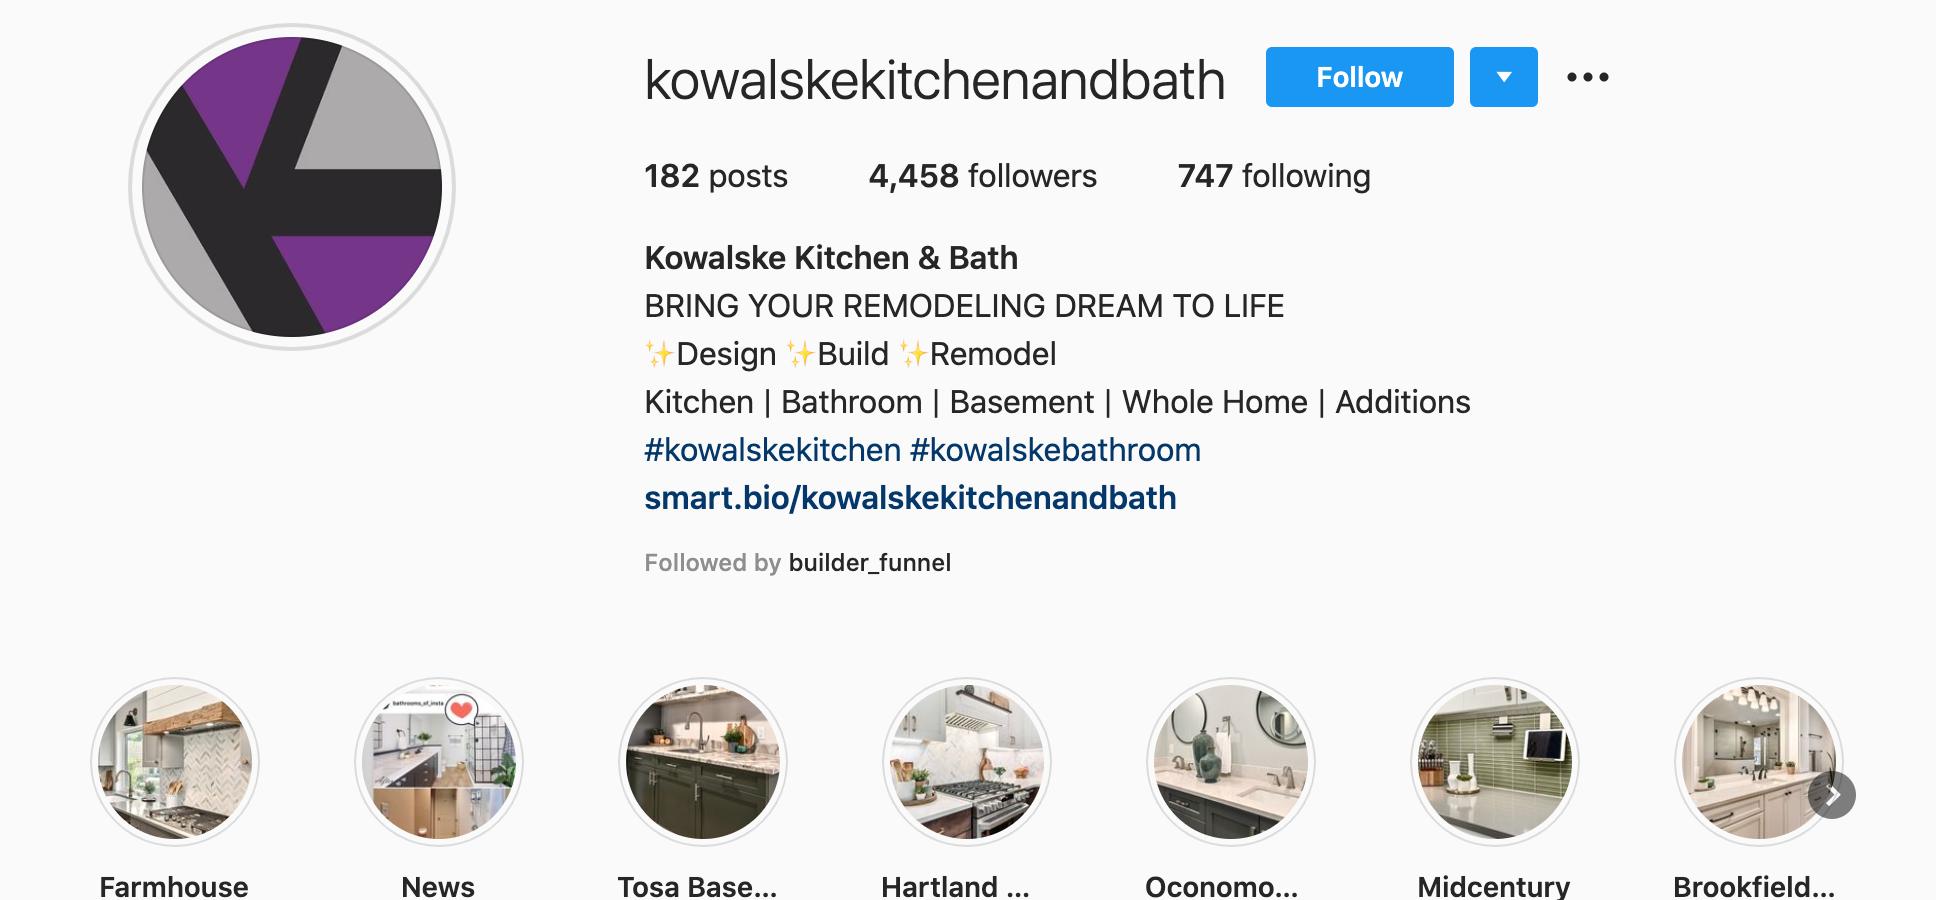 kowalske-kitchen-&-bath-kowalskekitchenandbath-iinstagram-profile